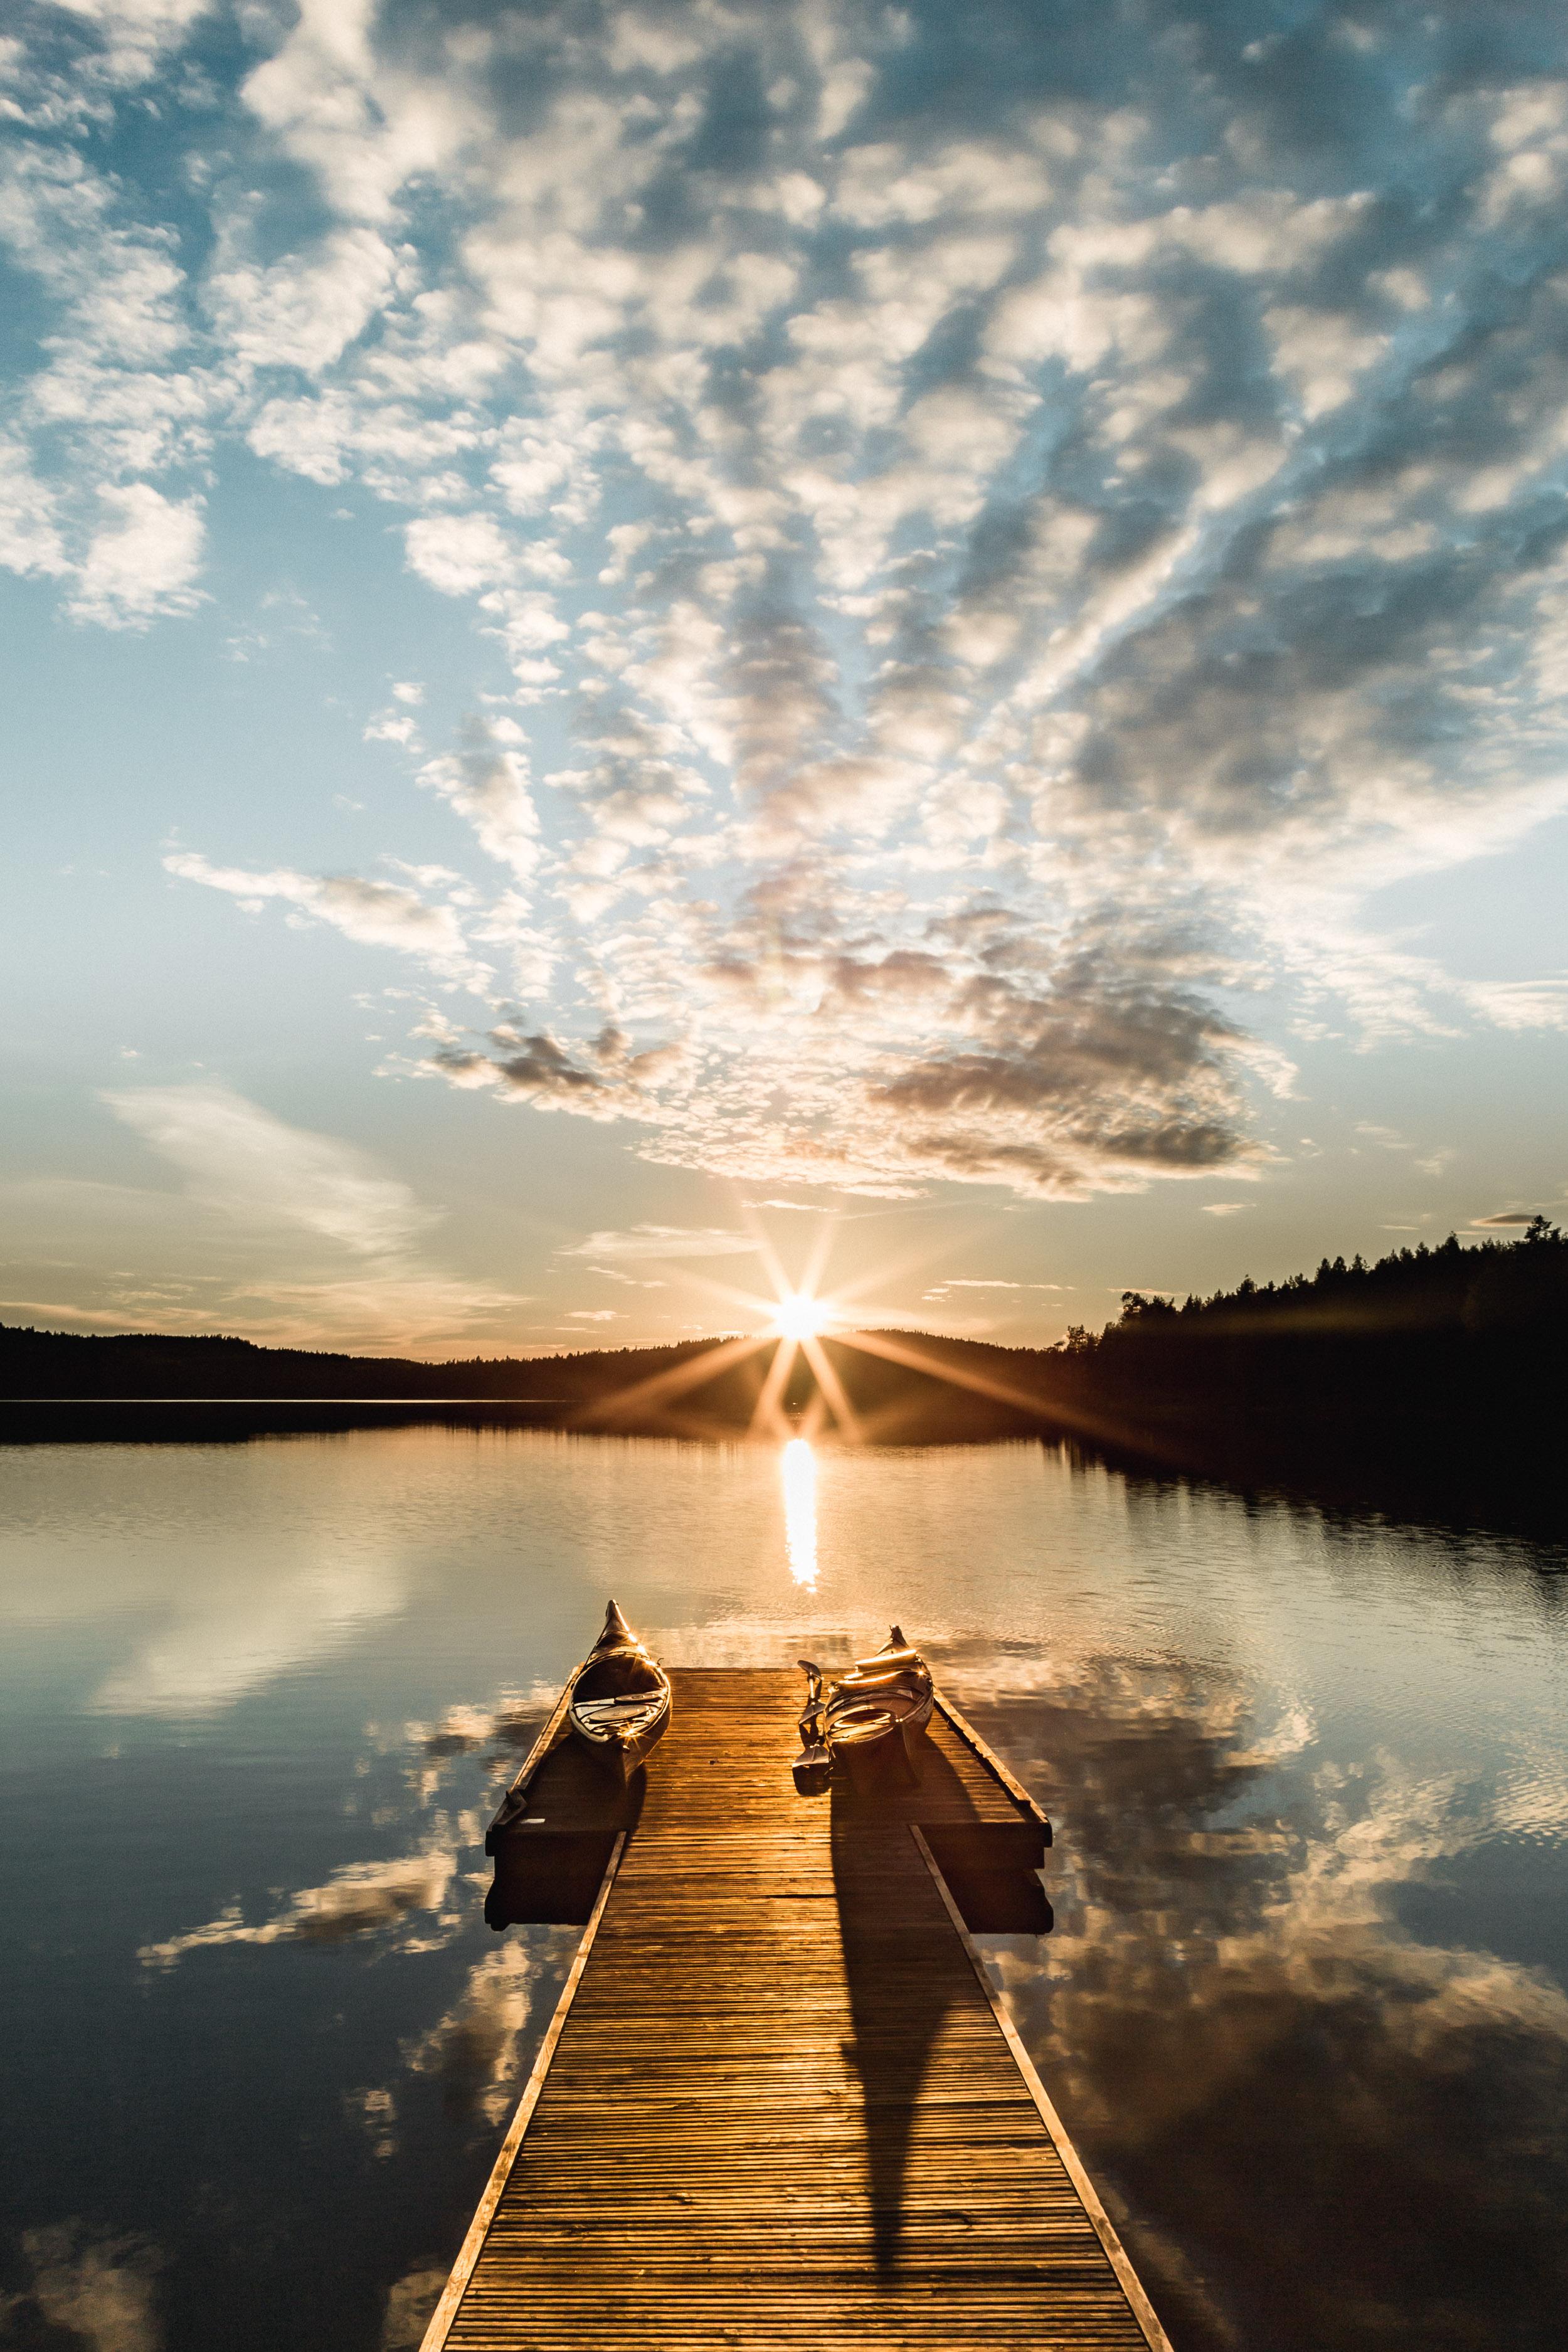 26-kolovesi-national-park-sunset-kayaking-camping-finland-anna-elina-lahti-photographer.jpg